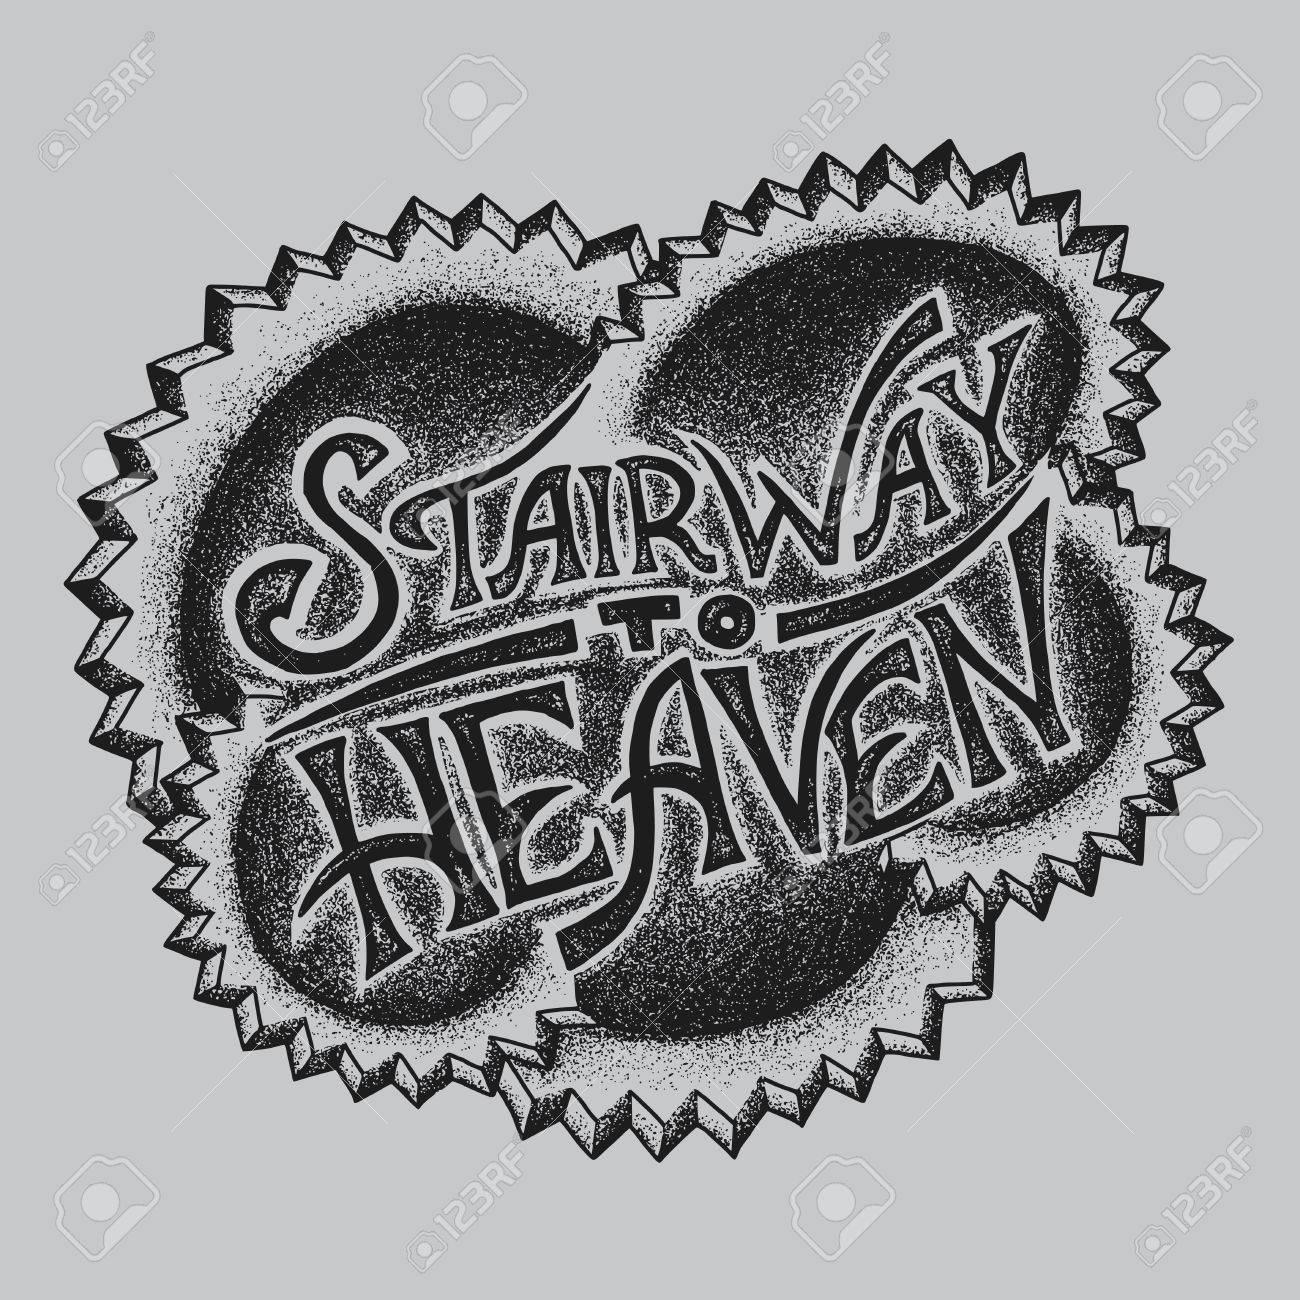 stairway to heaven words